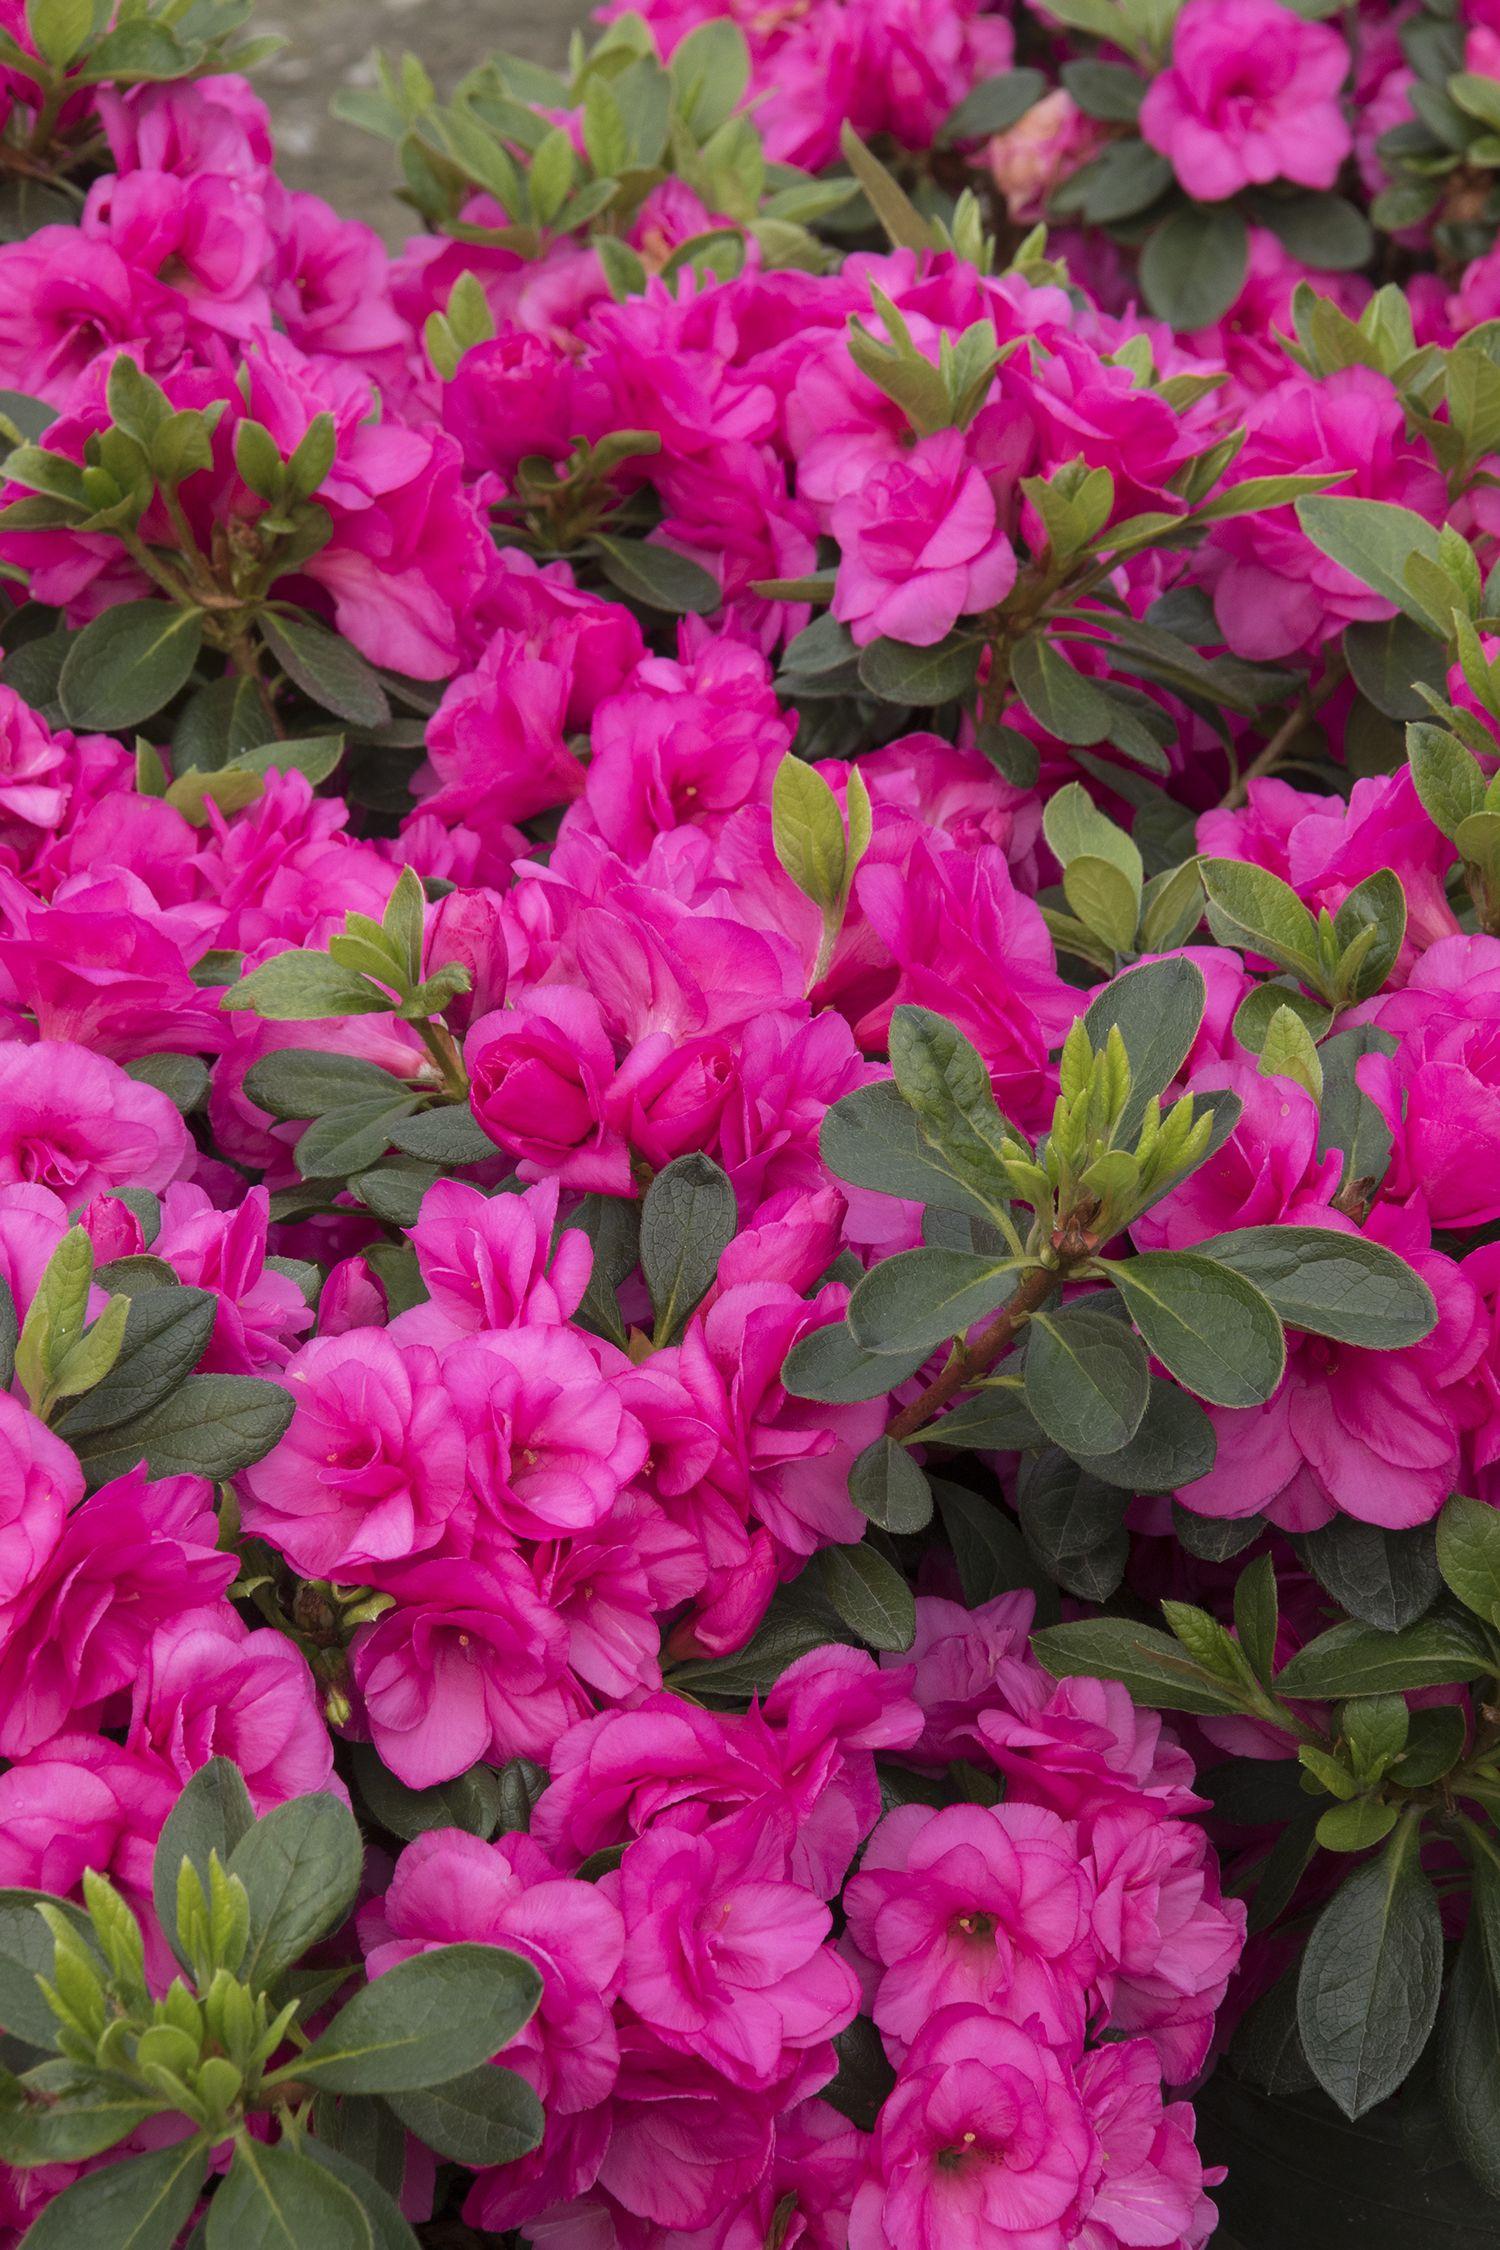 Happy Days Pink Azalea Monrovia Happy Days Pink Azalea Pink Azaleas Planting Hydrangeas Florida Flowers